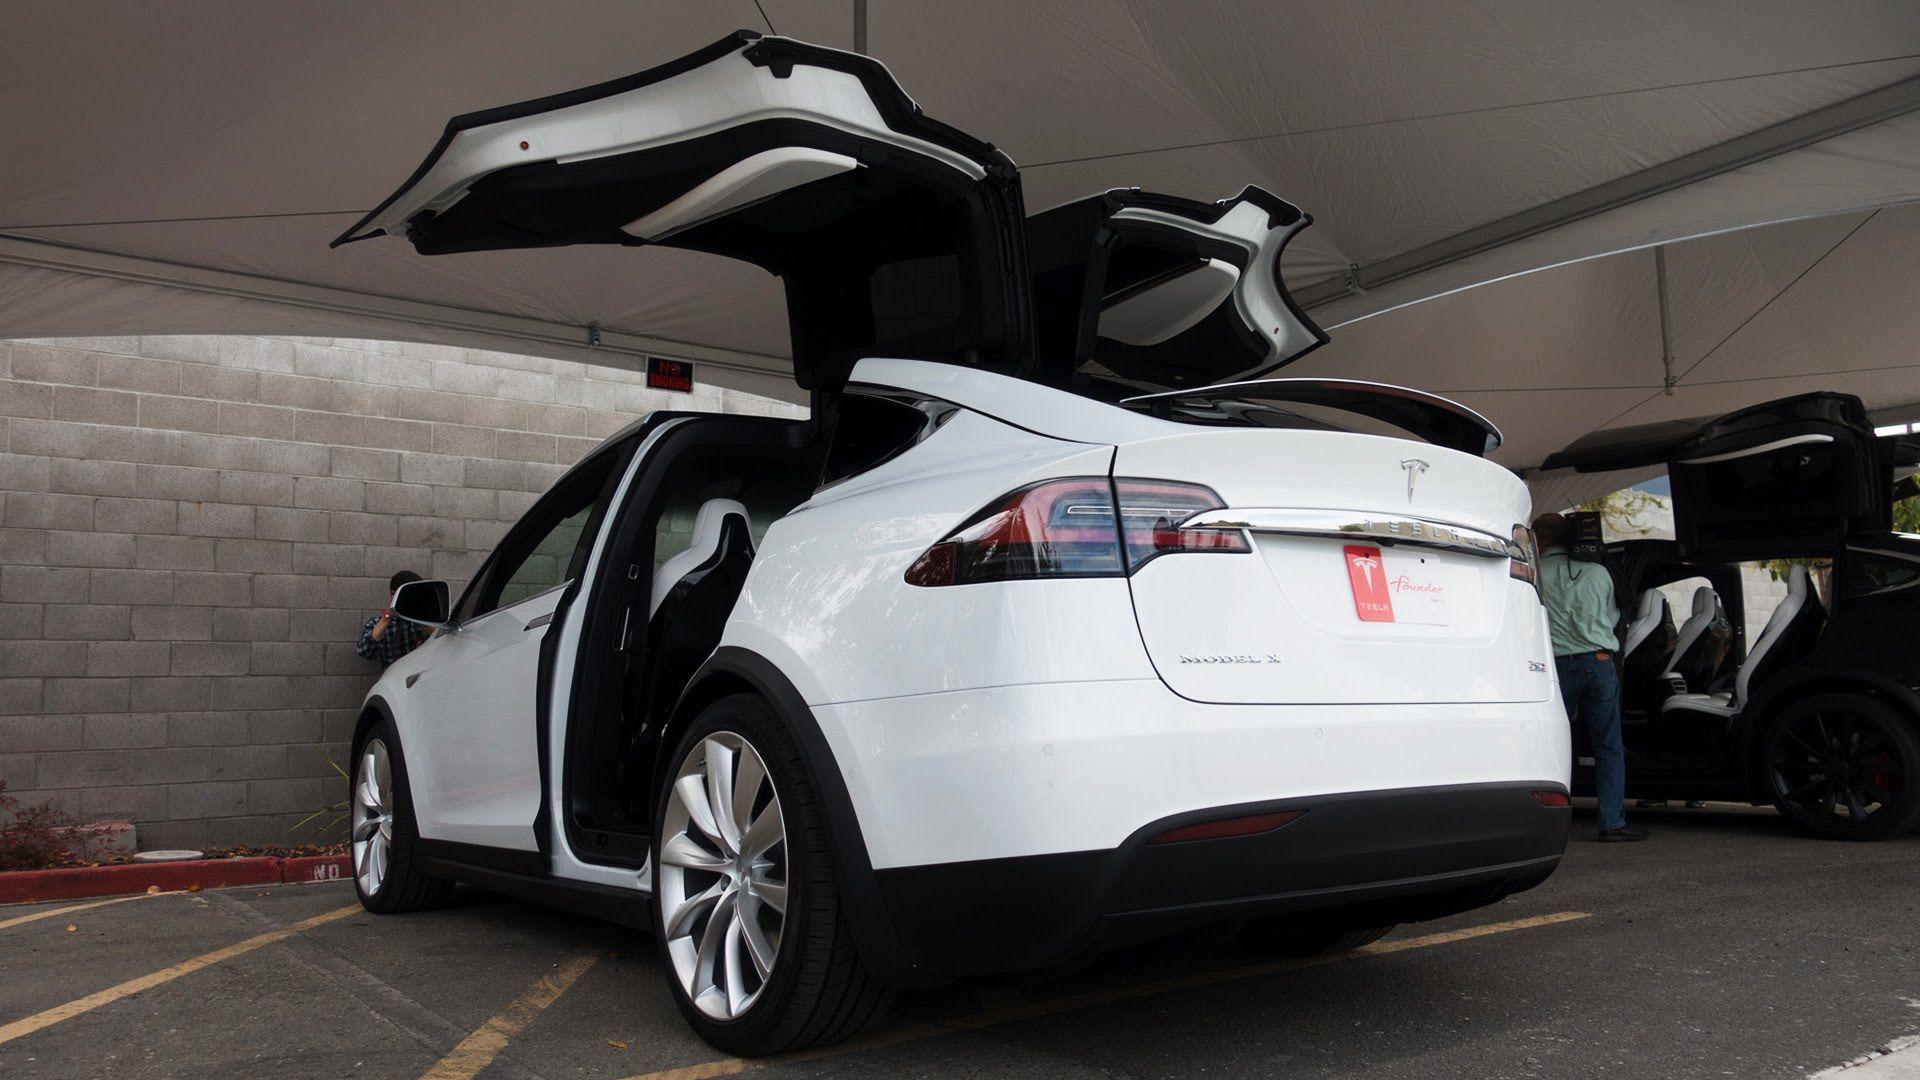 Tesla Model X first drive Carros elétricos, Auto, Carros